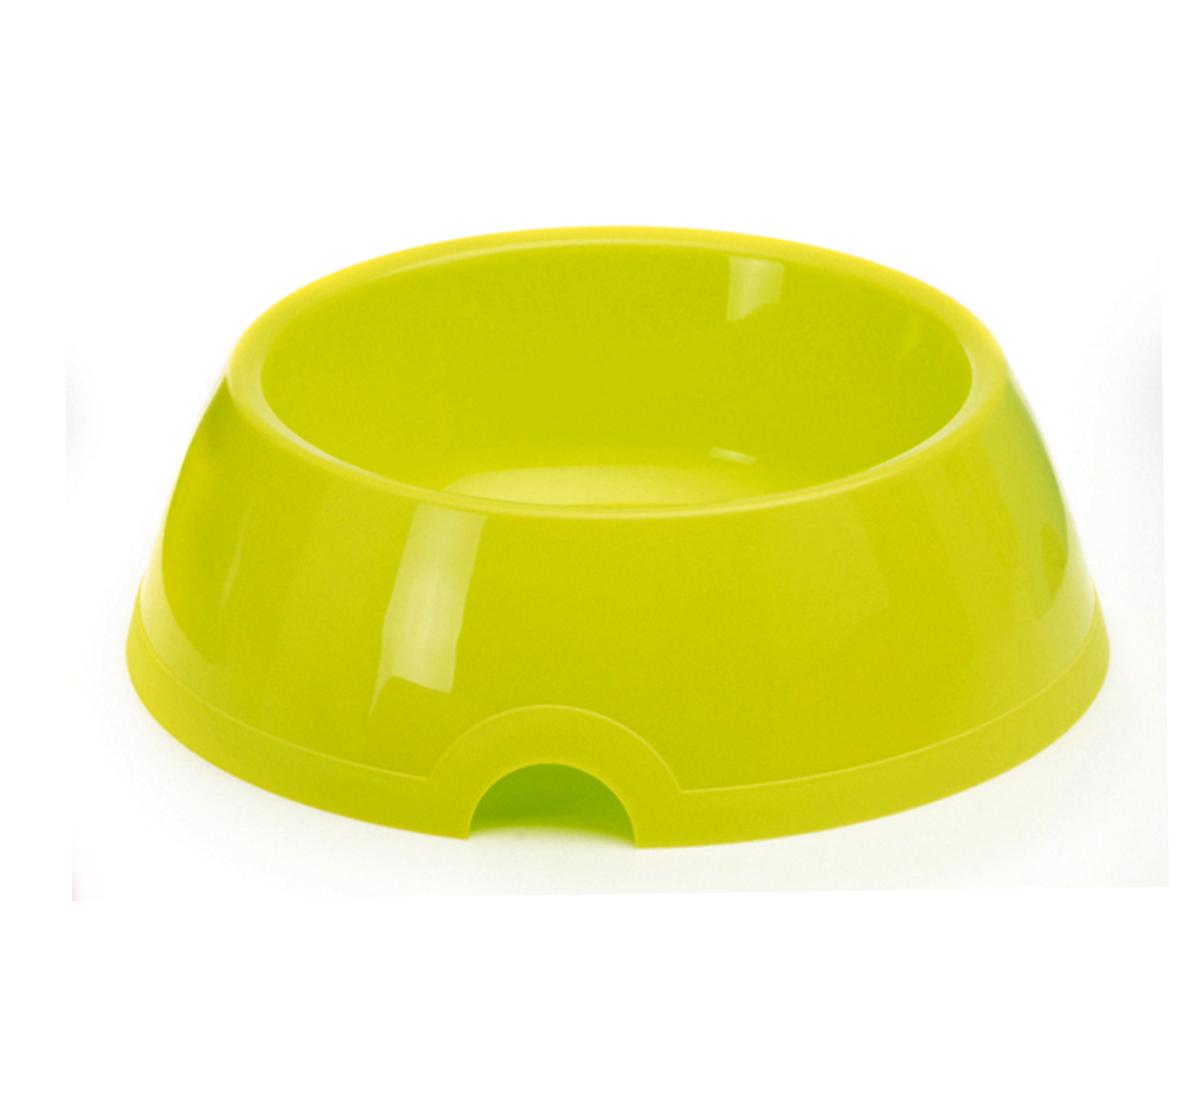 Savic Picnic Bowls 3 -1250ml